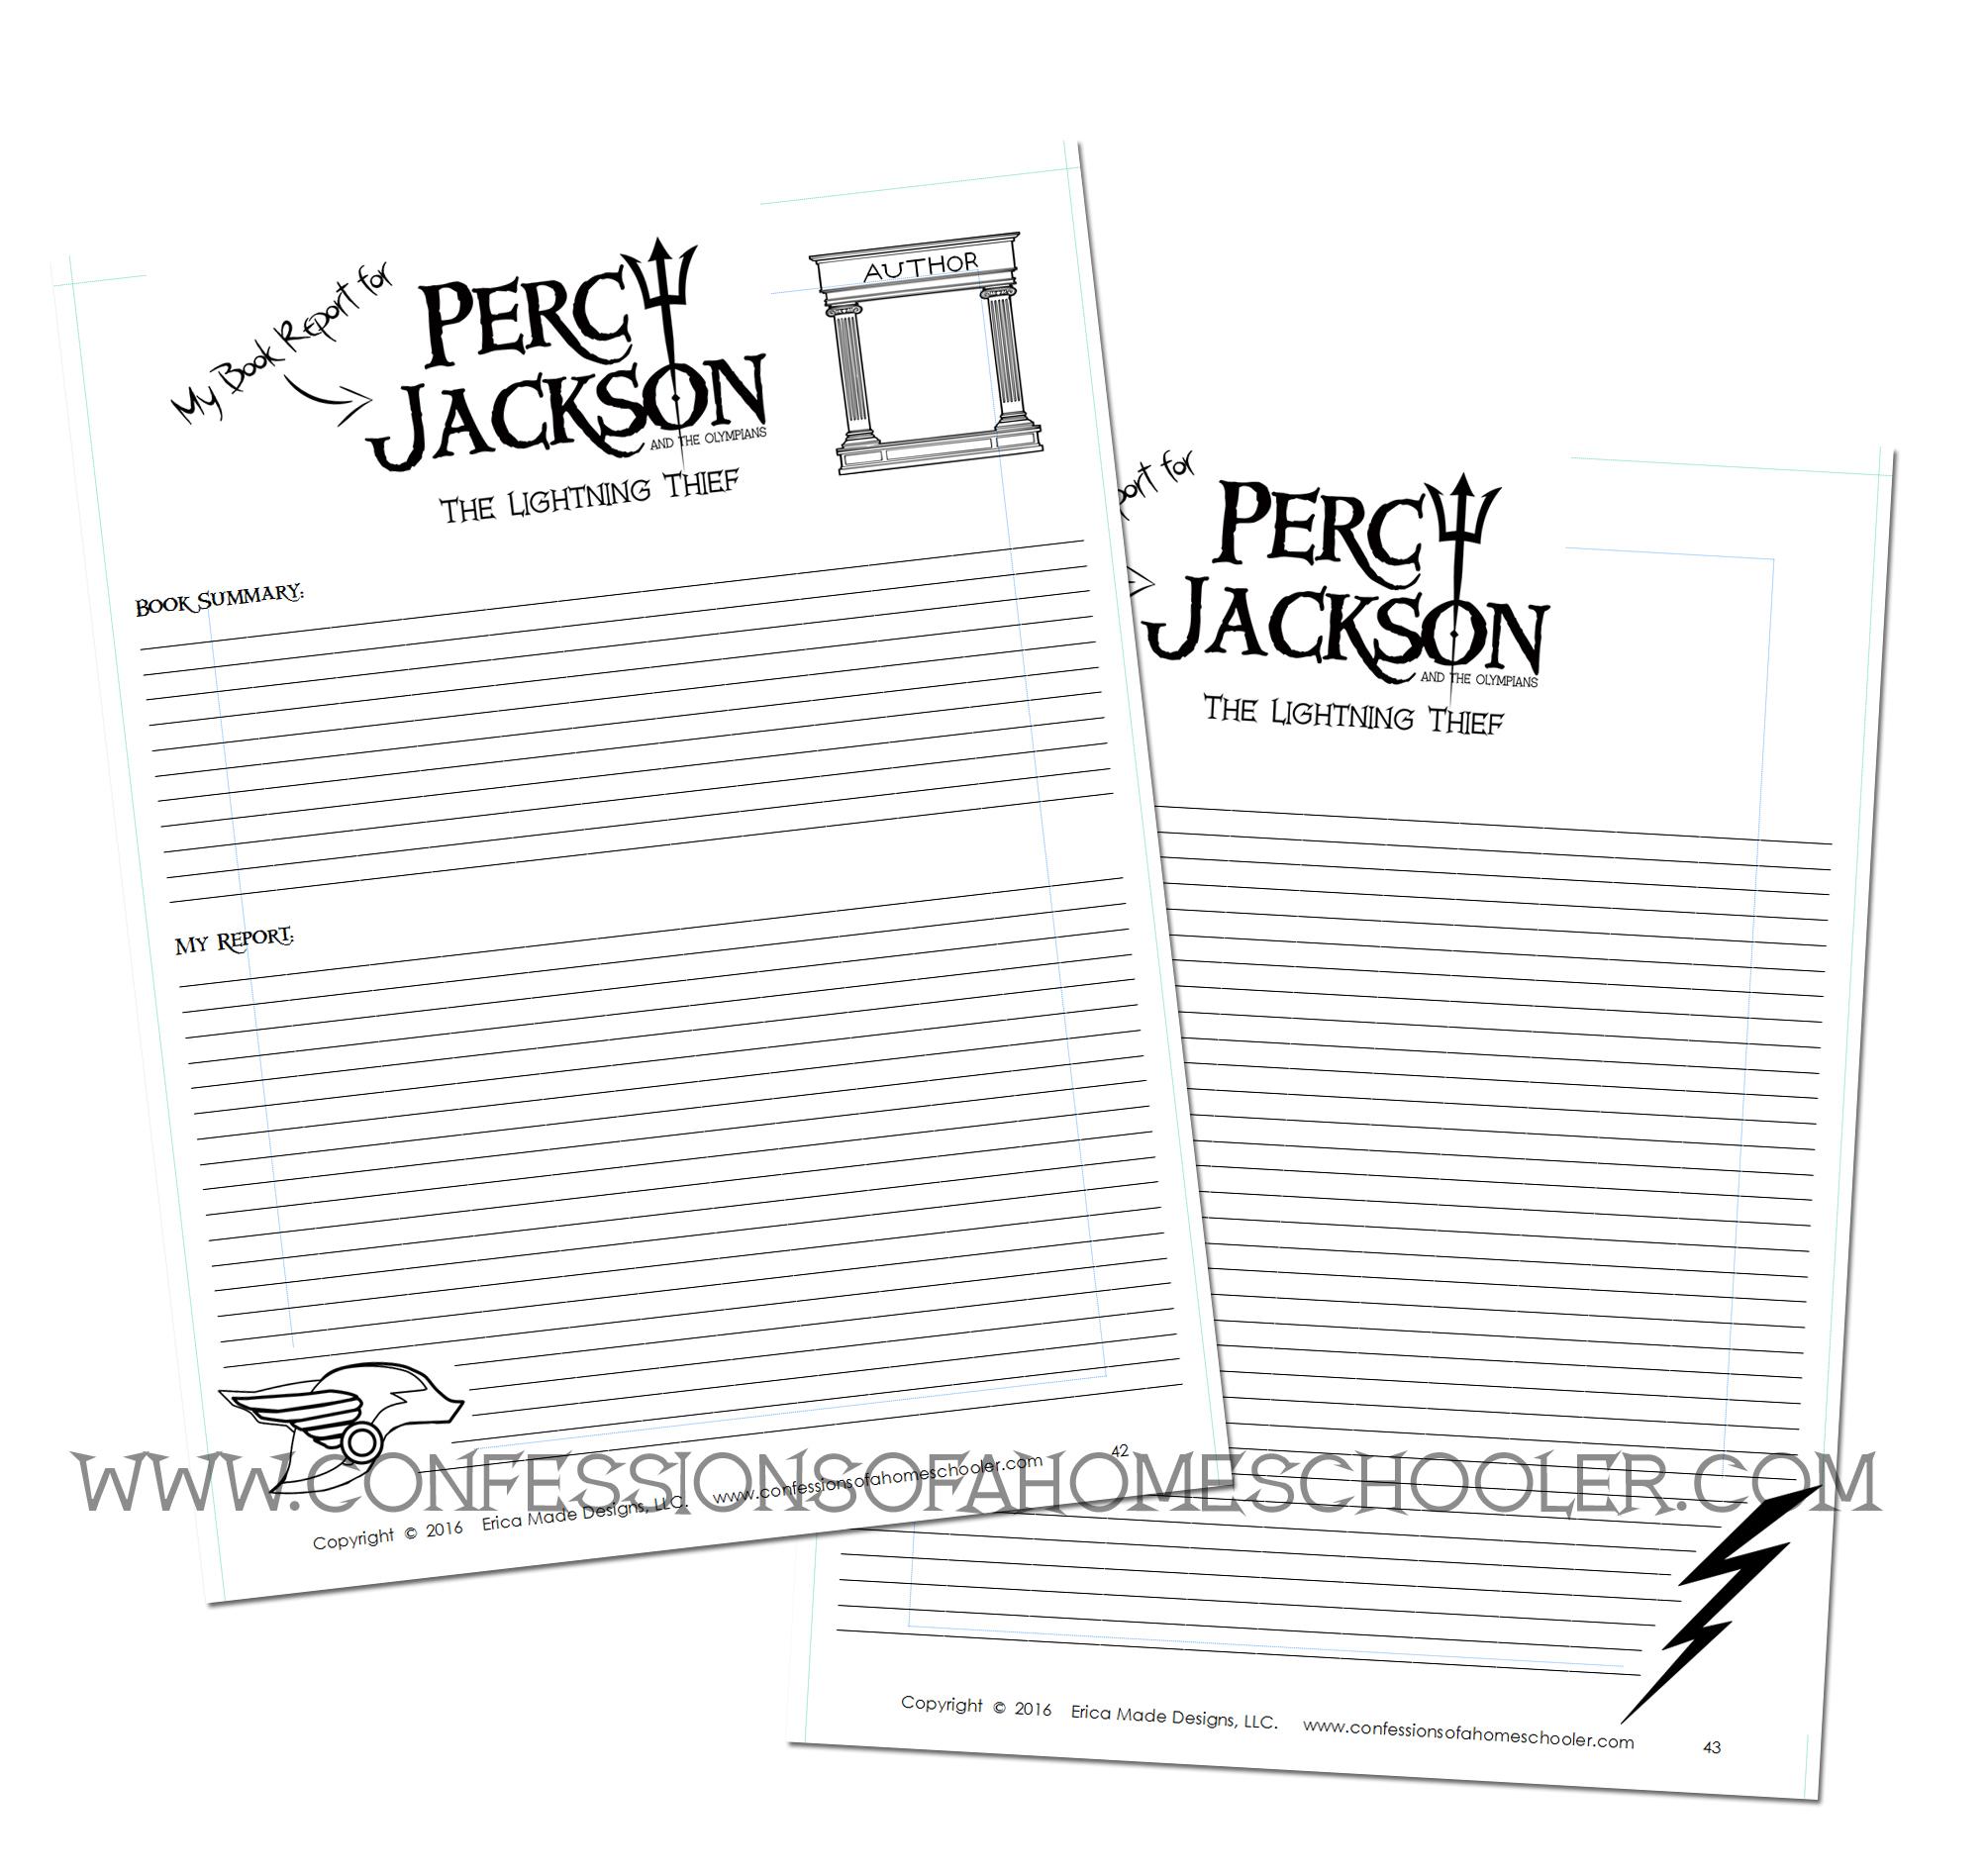 percy jackson literature unit confessions of a homeschooler. Black Bedroom Furniture Sets. Home Design Ideas